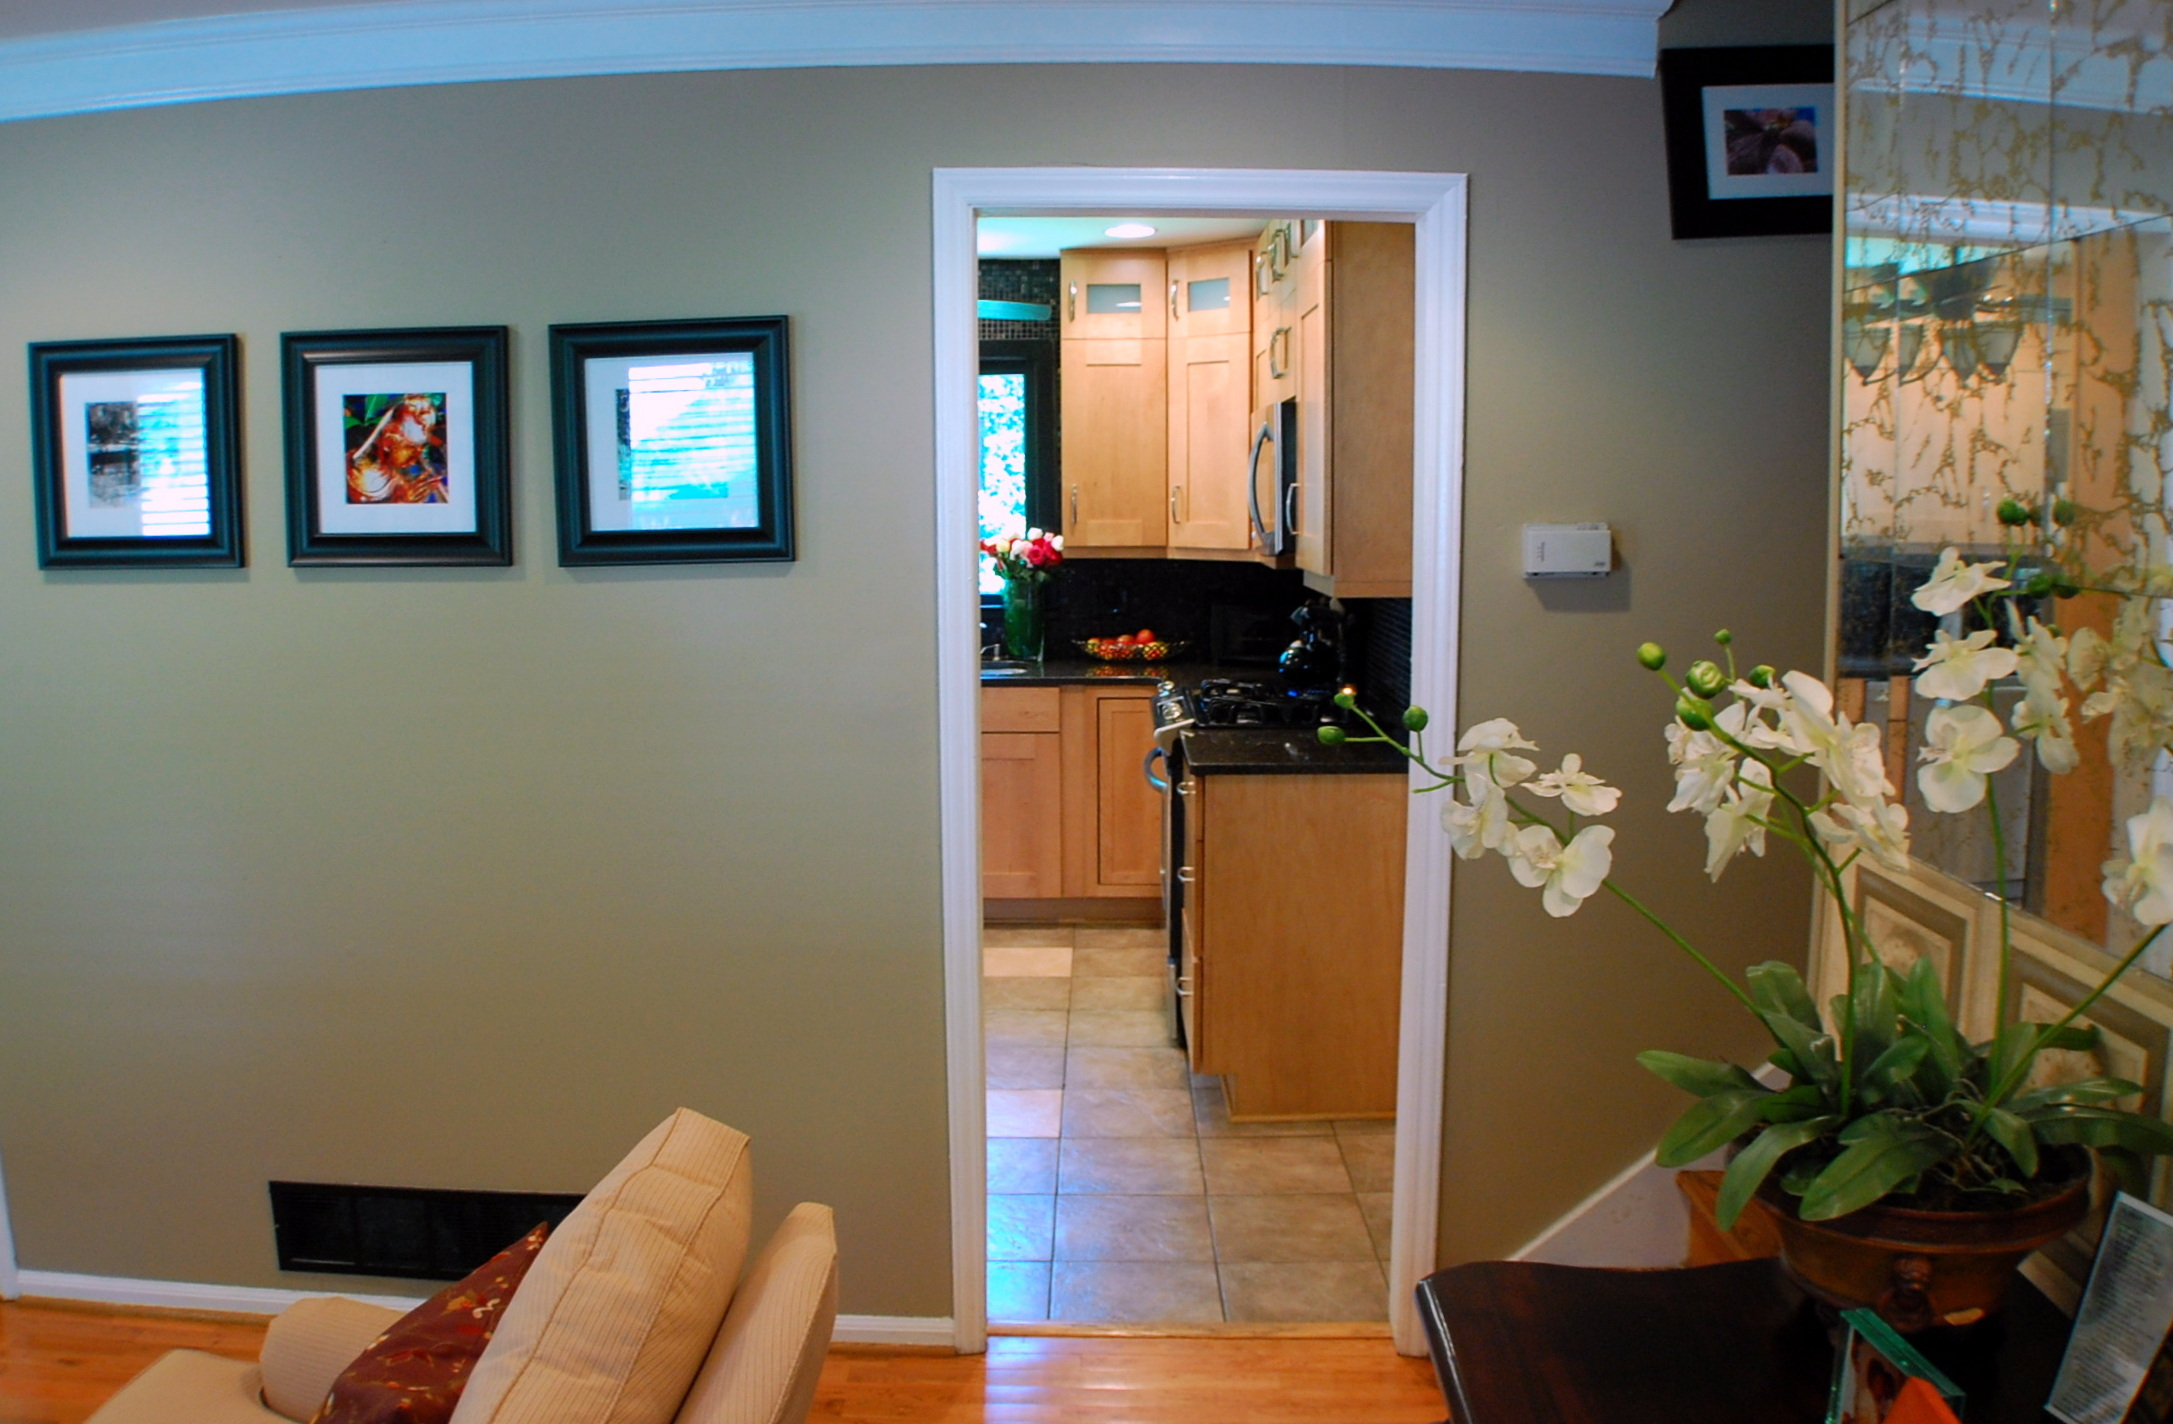 Like The Living Room In My Parentu0027s ... Part 47